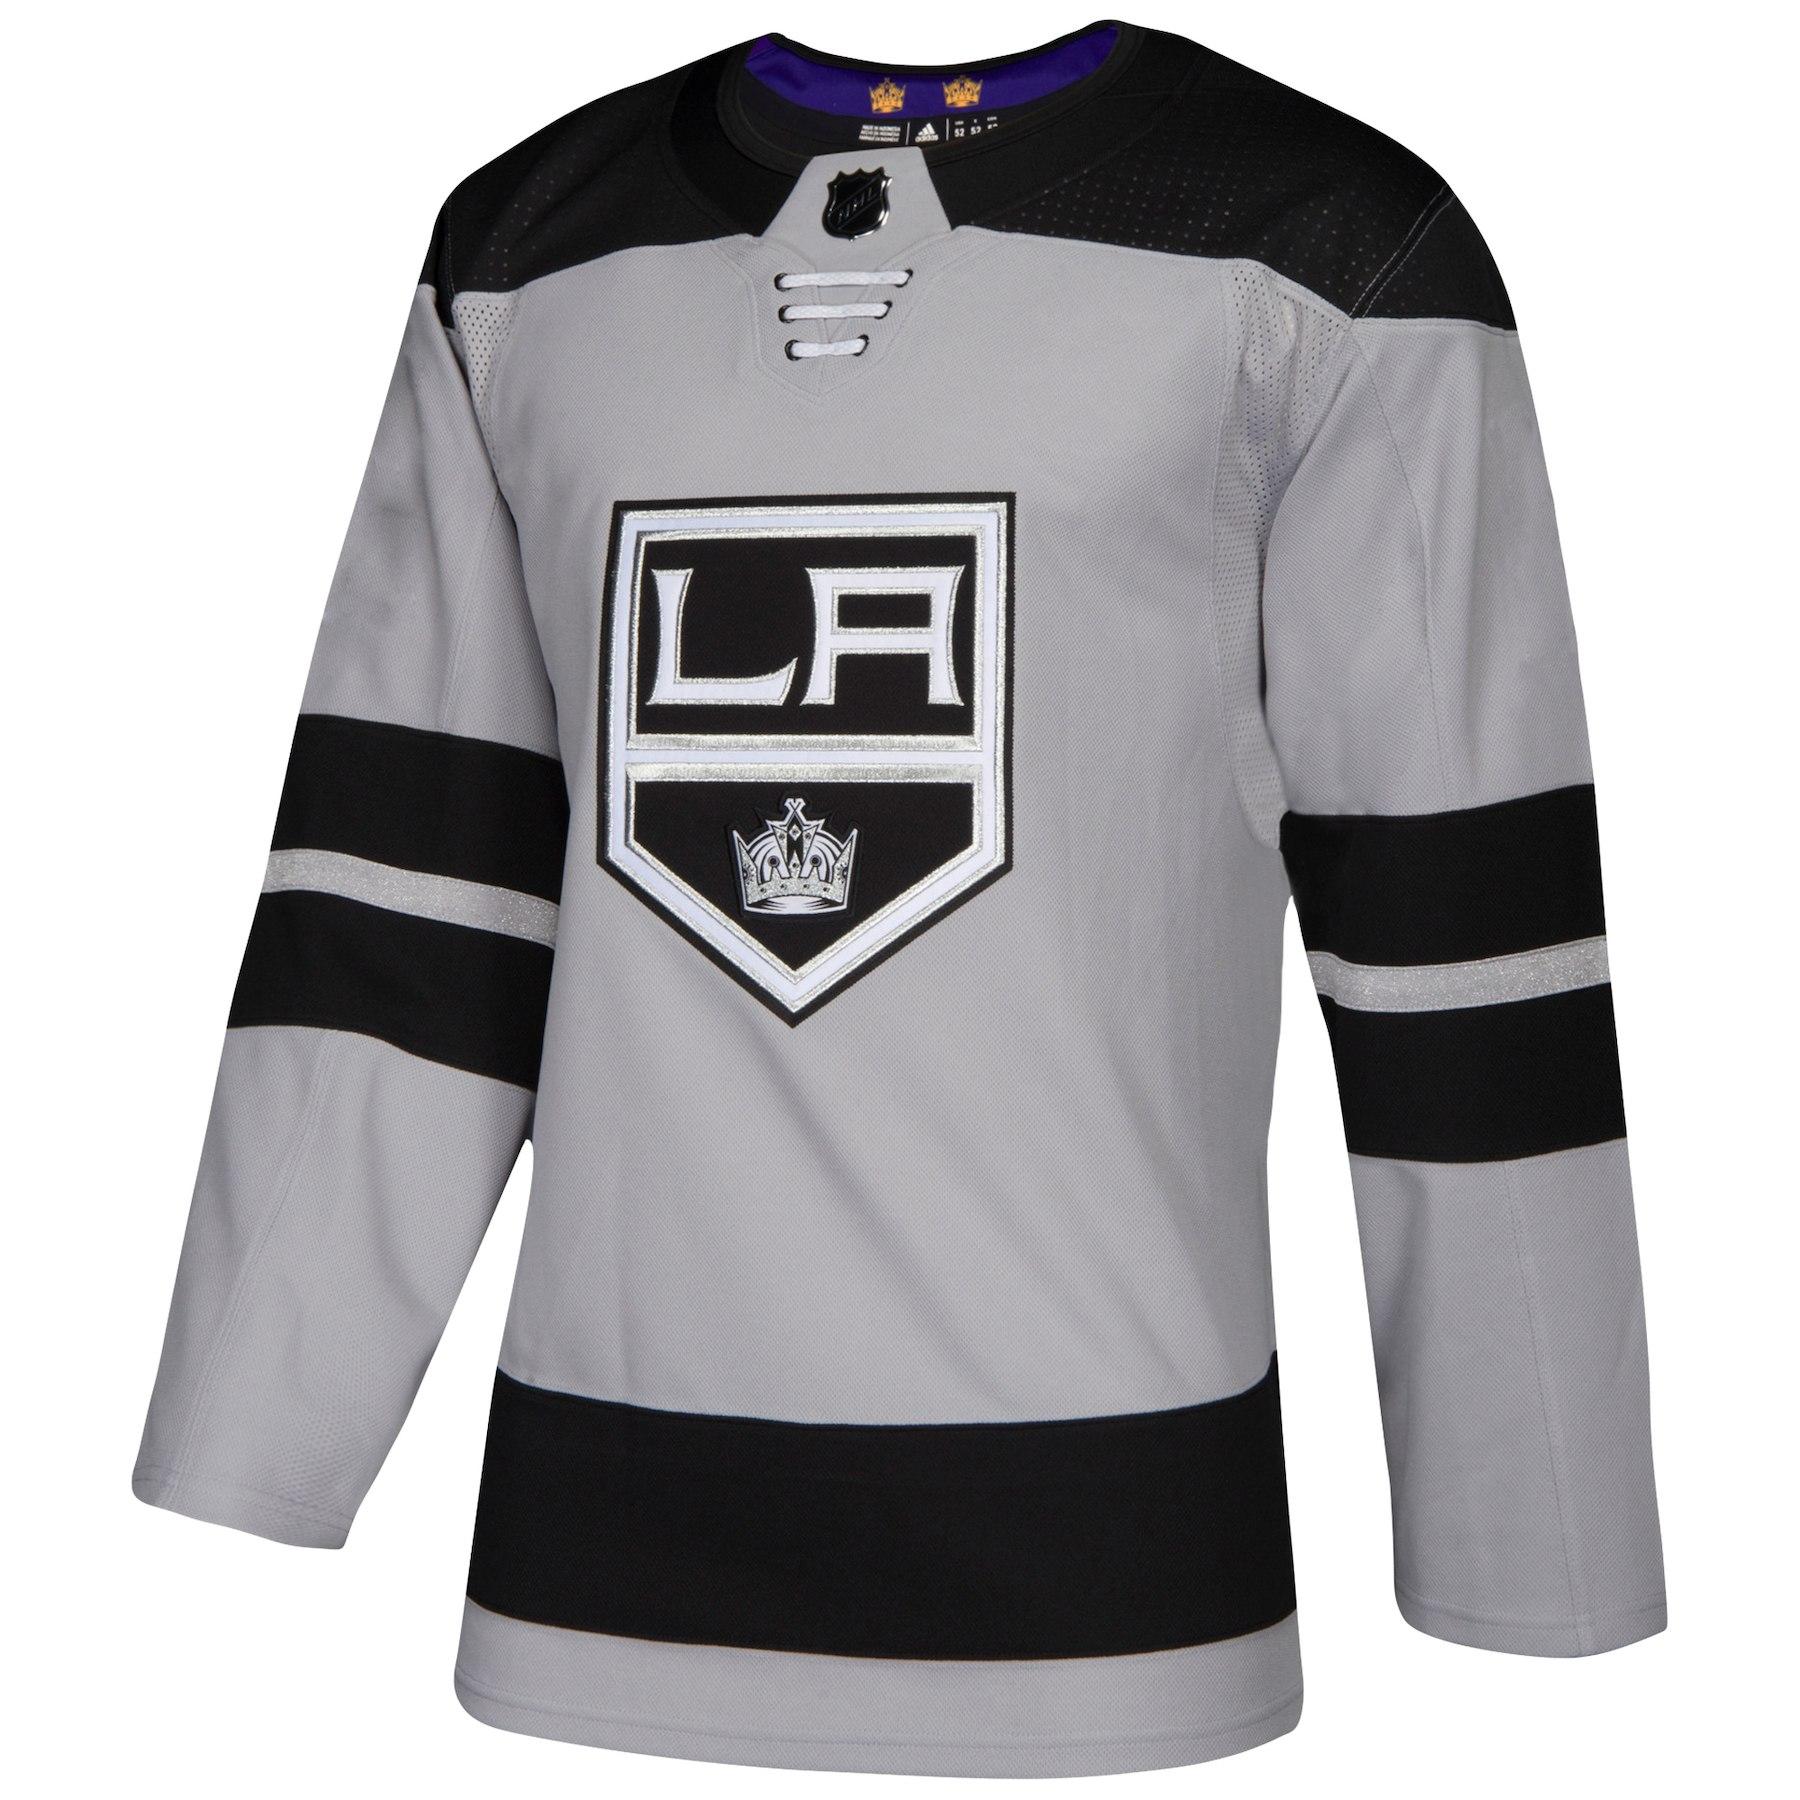 half off 2ac0f 15702 Los Angeles Kings adidas adizero NHL Authentic Pro Alternate Jersey